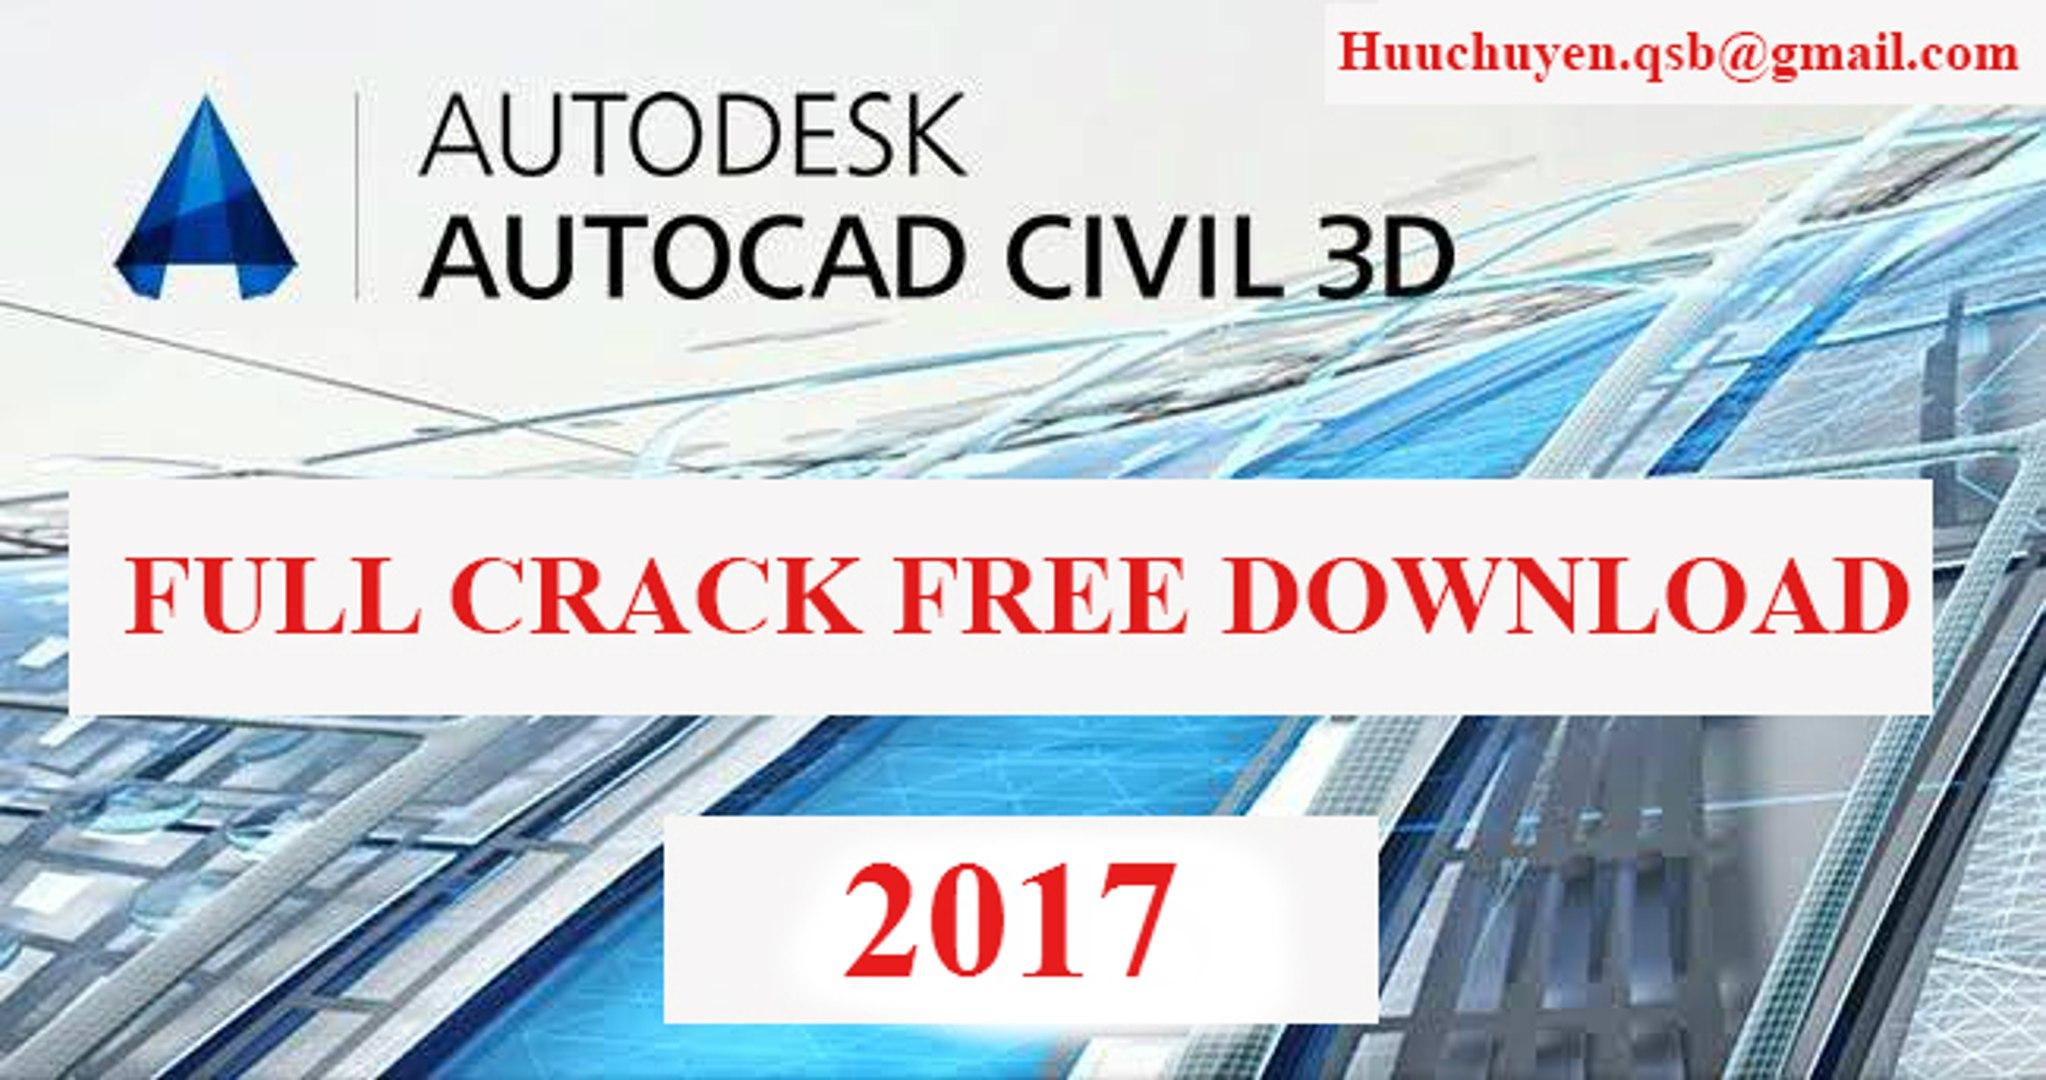 Tutorial Setup And Crack Civil 3d 2017 Full Link Download